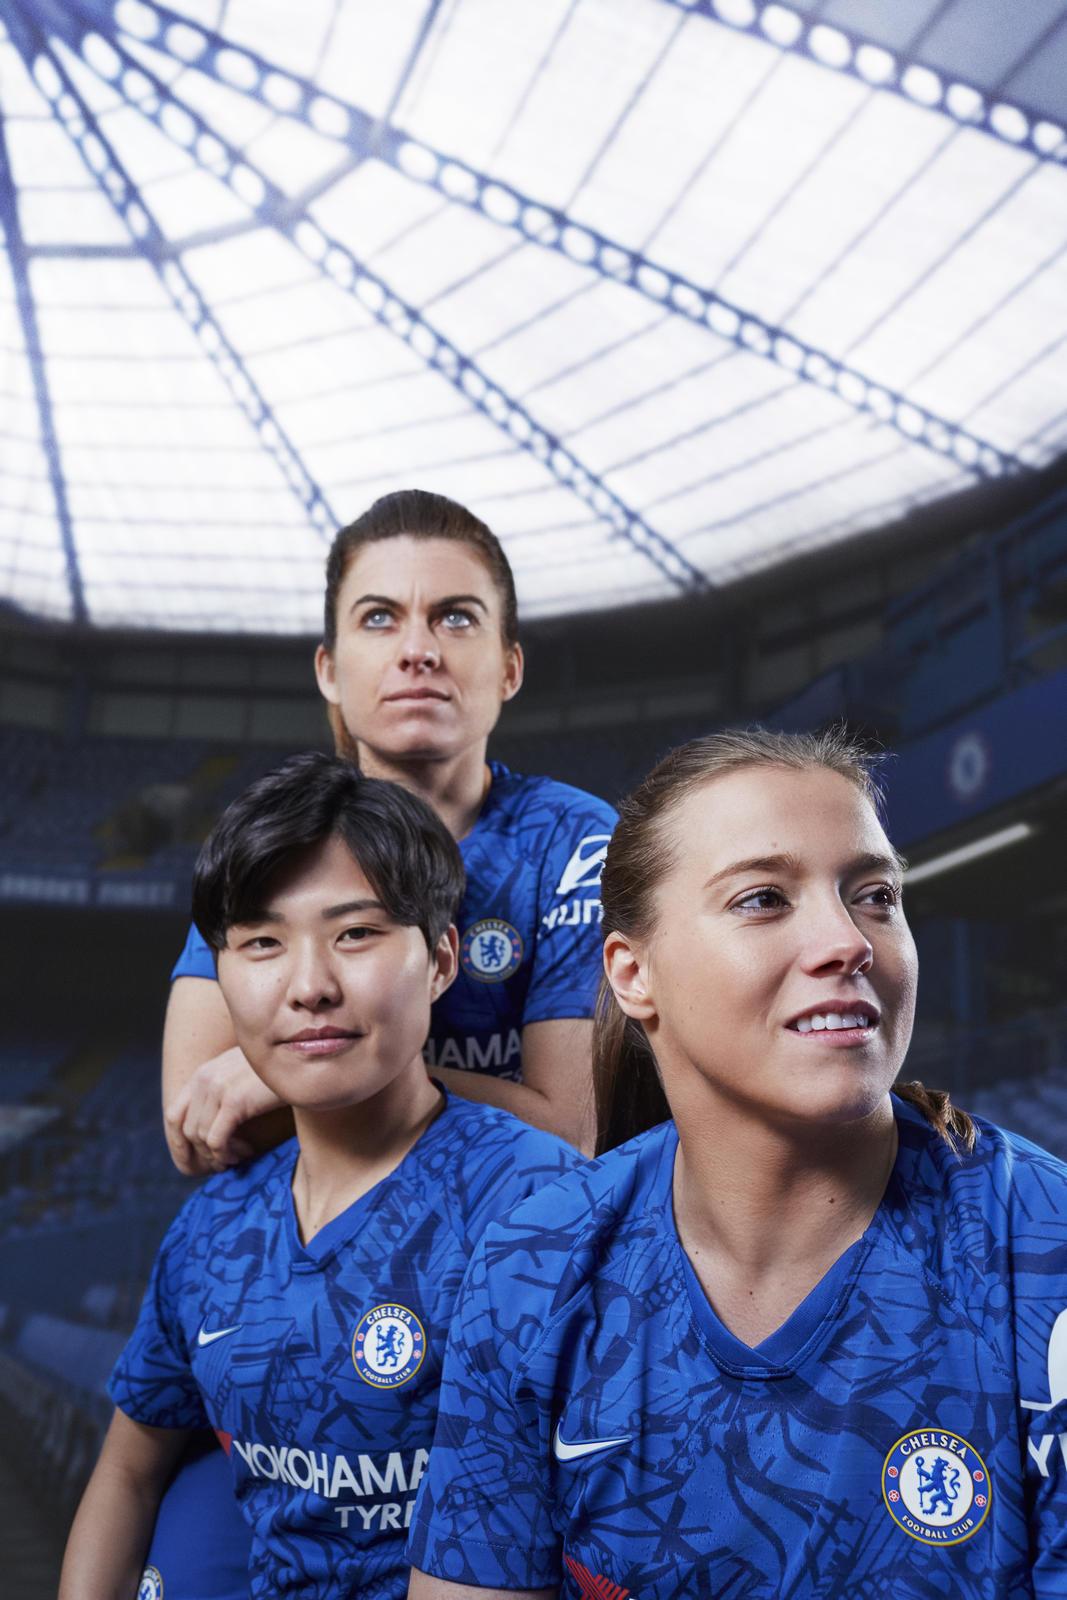 Nike_ChelseaFC_HomeKit_2019-20_2_native_1600.jpg